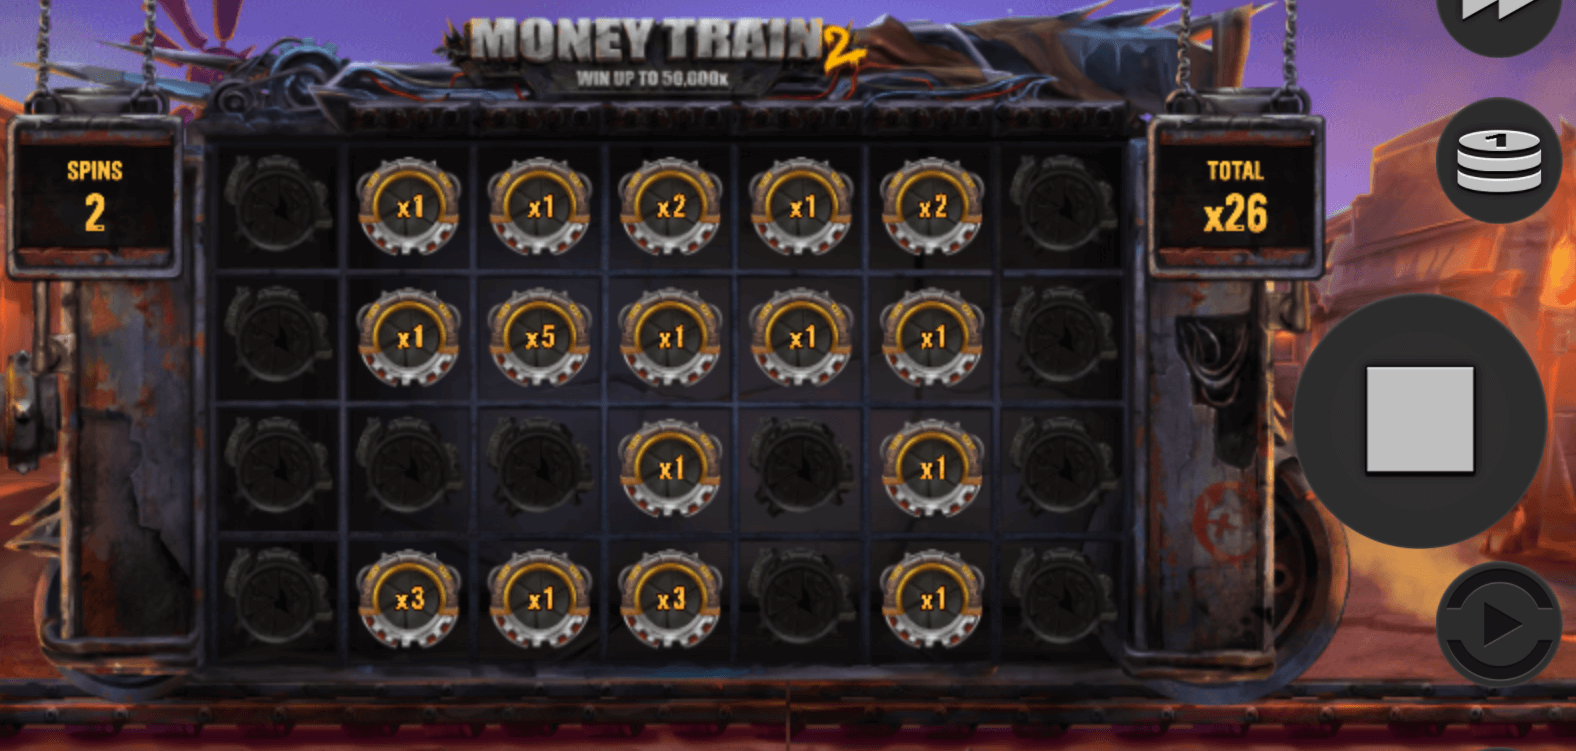 Money Train 2 slot bonus round screenshot